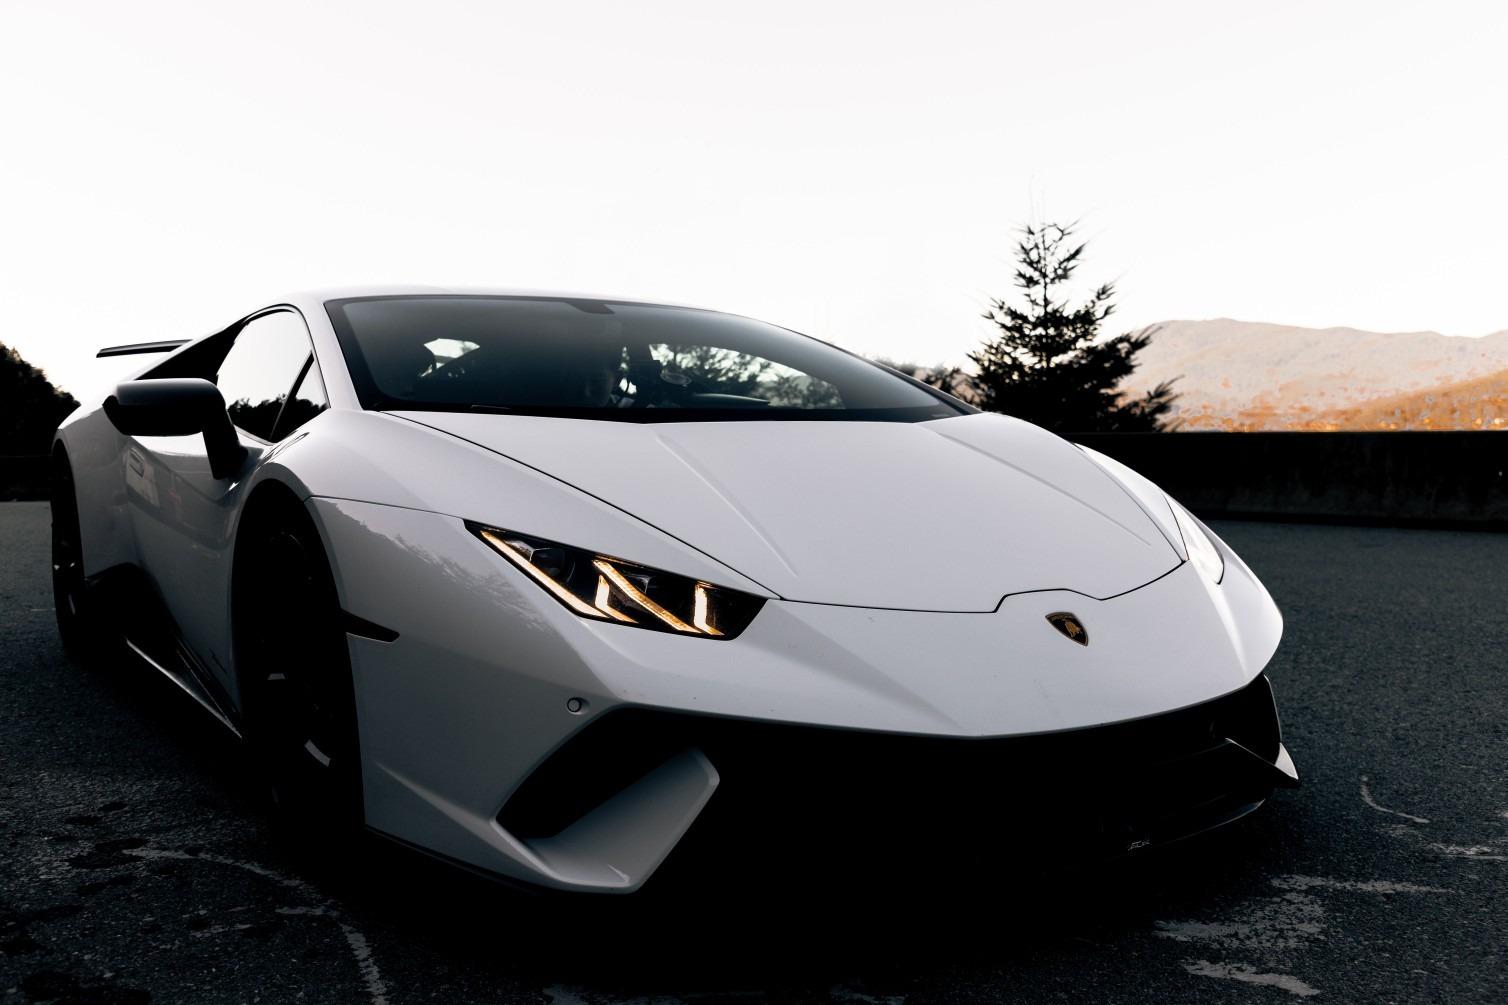 White Lamborghini Aventador on road